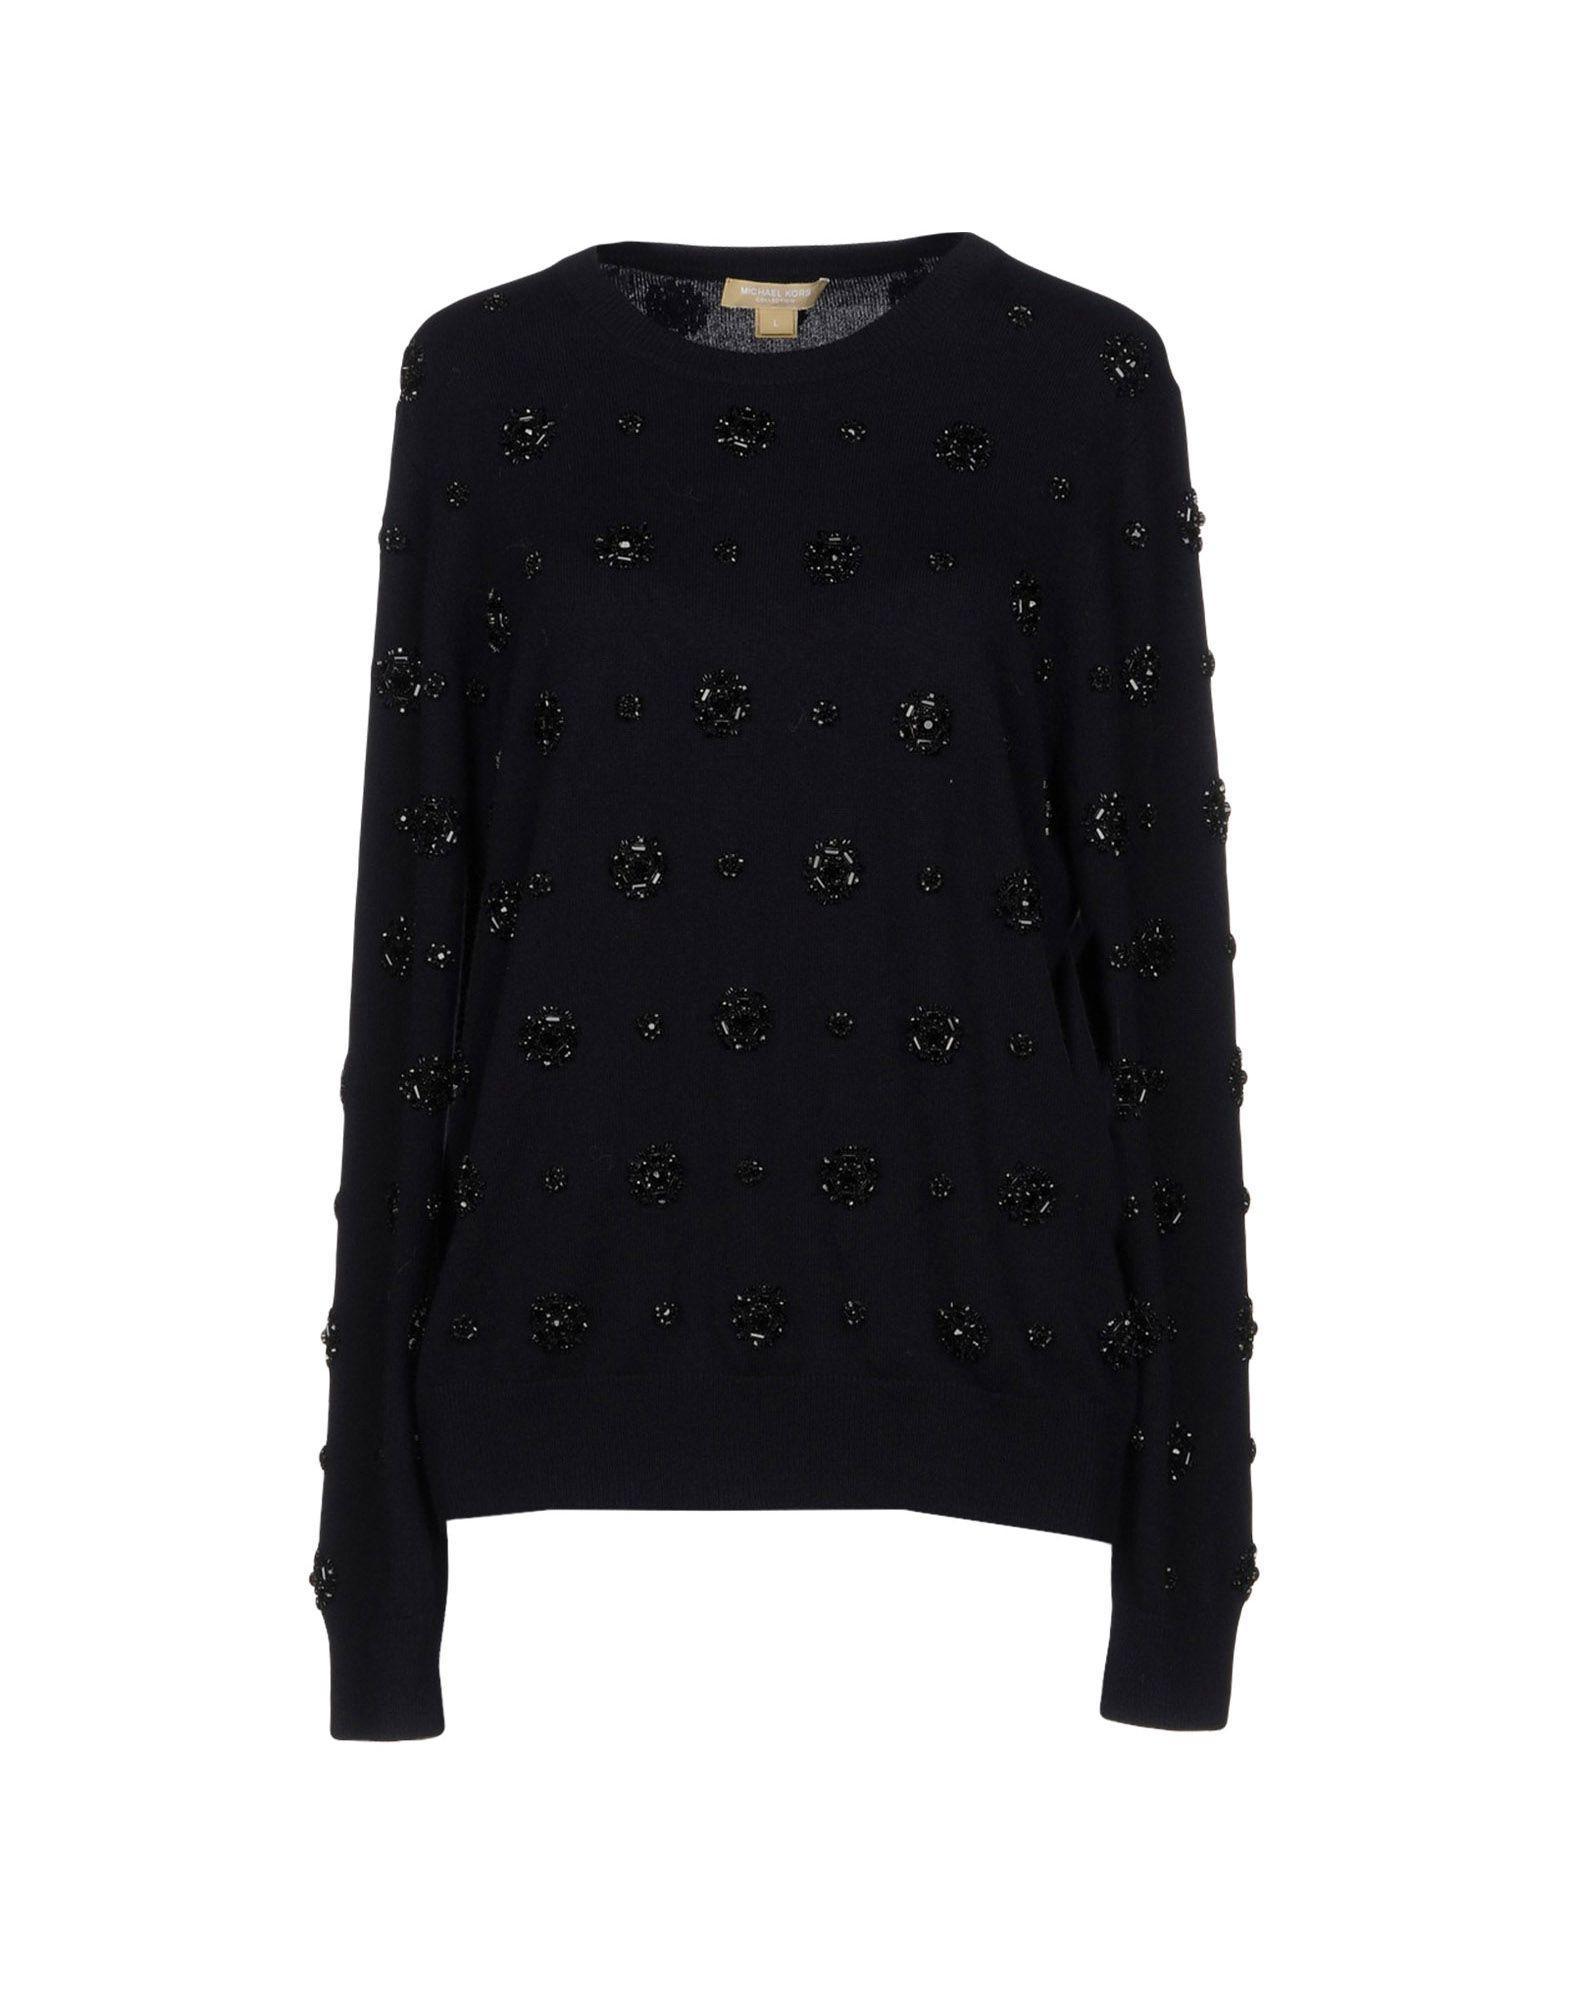 Michael Kors Sweaters In Dark Blue